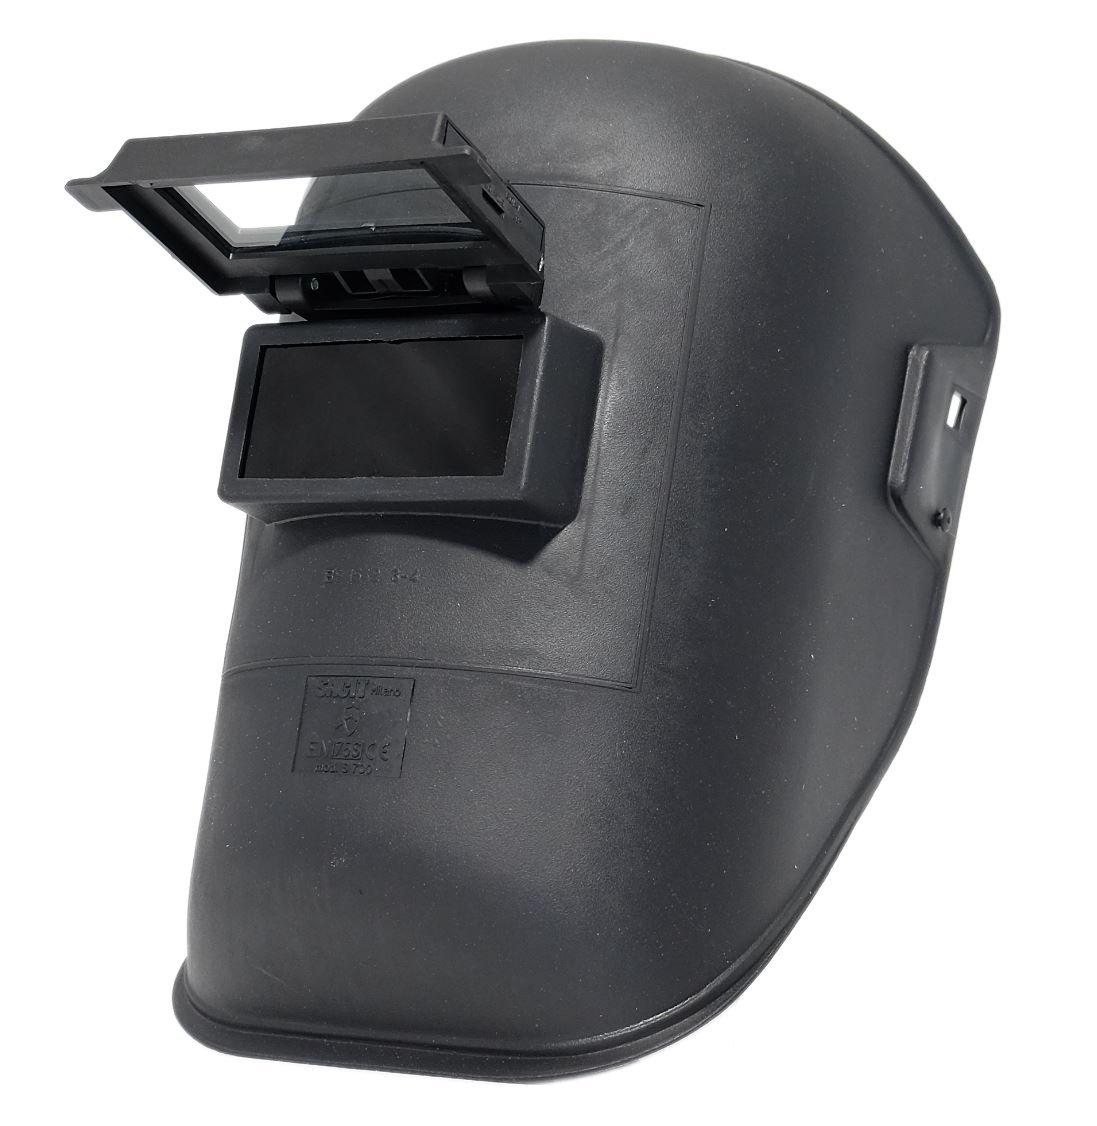 Proweltek PR1046 Masque à souder visière relevable s700r